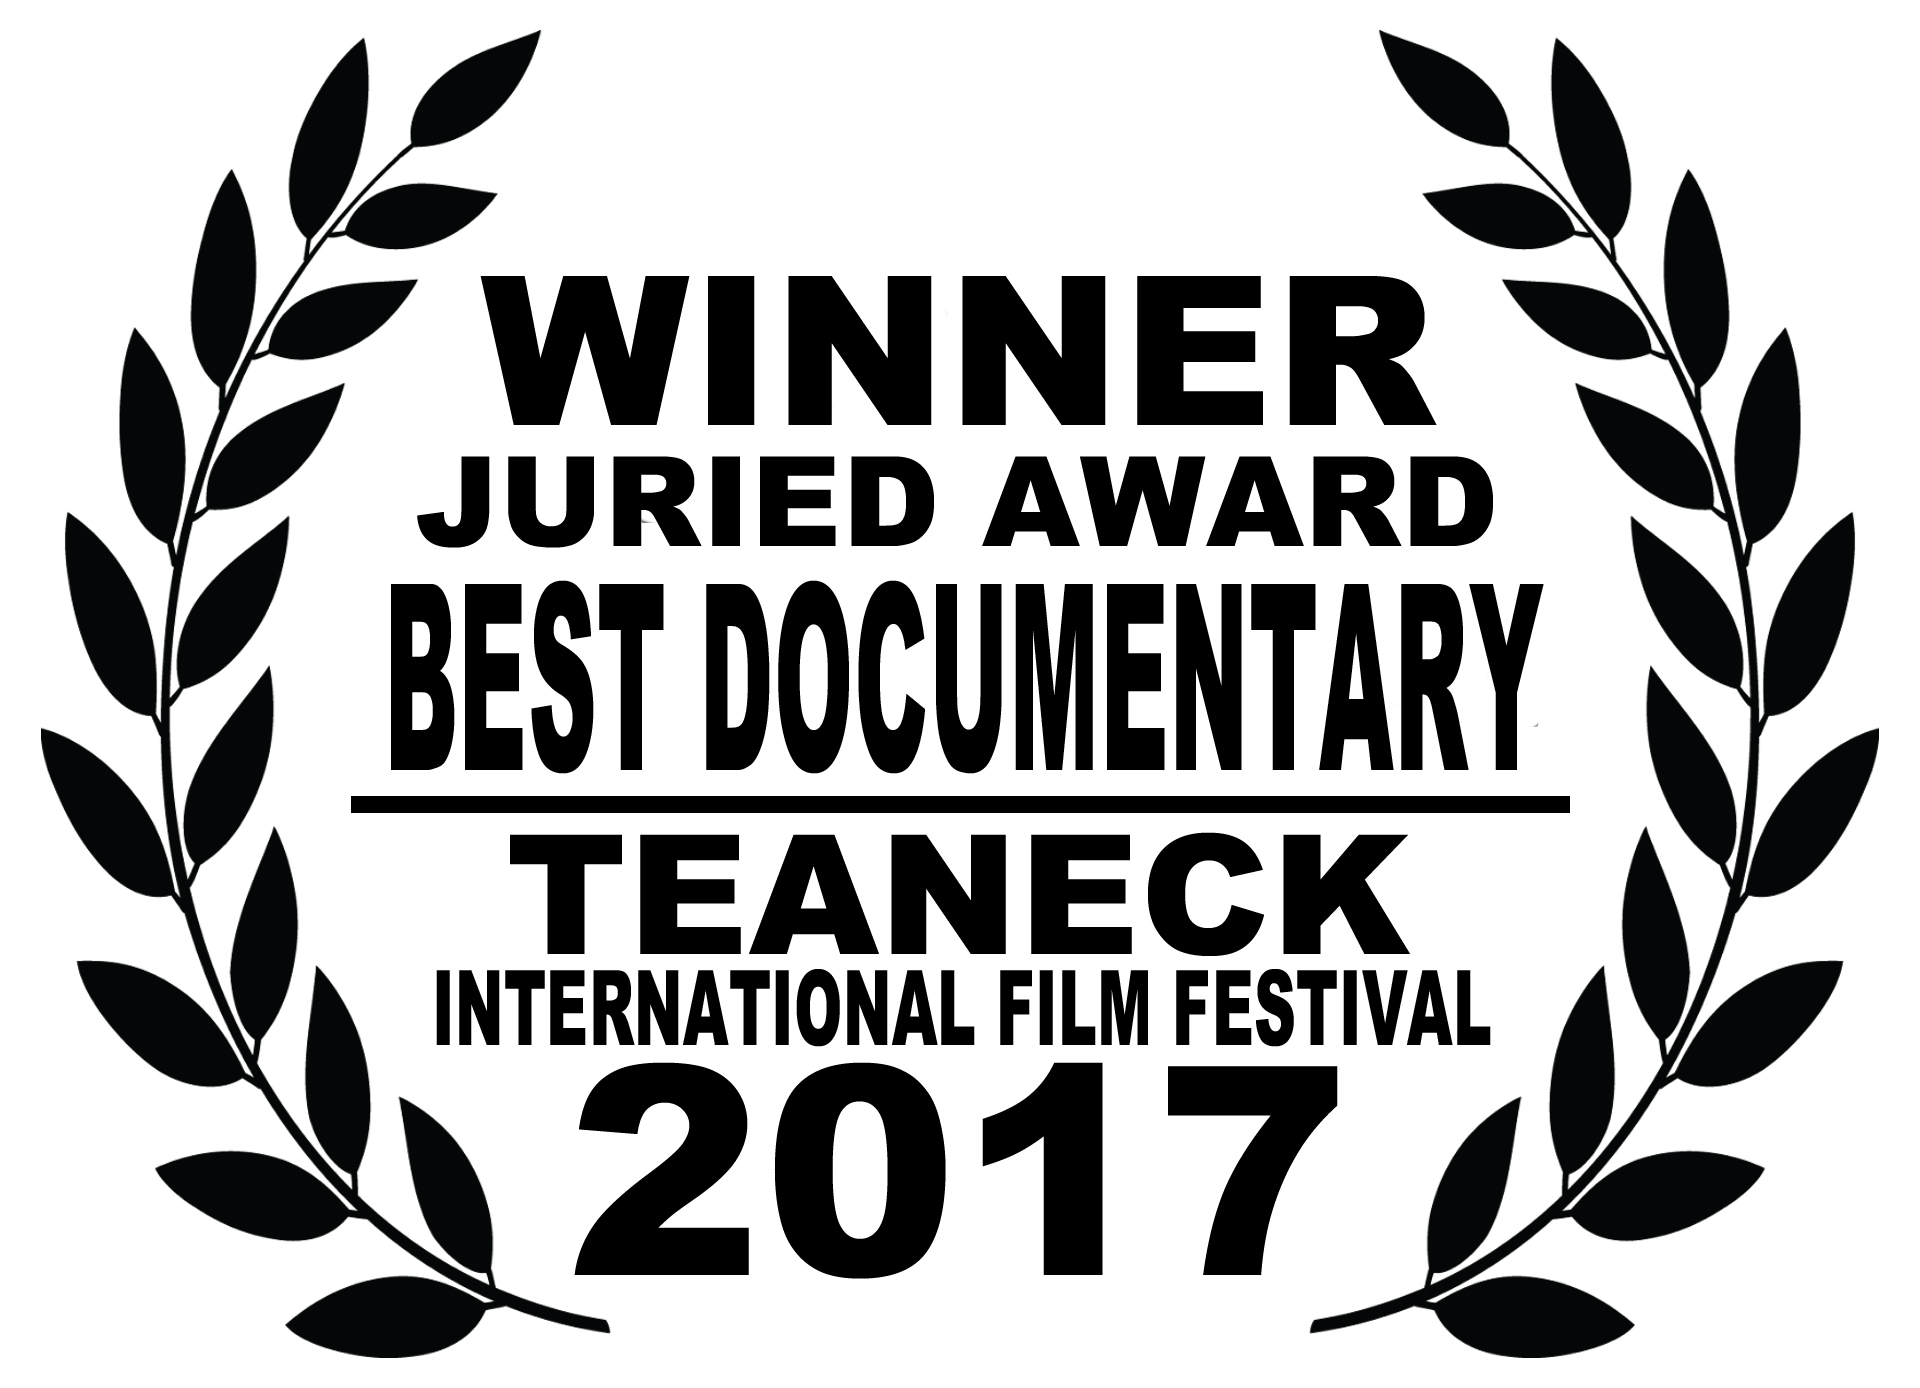 TEANECK 2017 JURIED - DOC.jpg